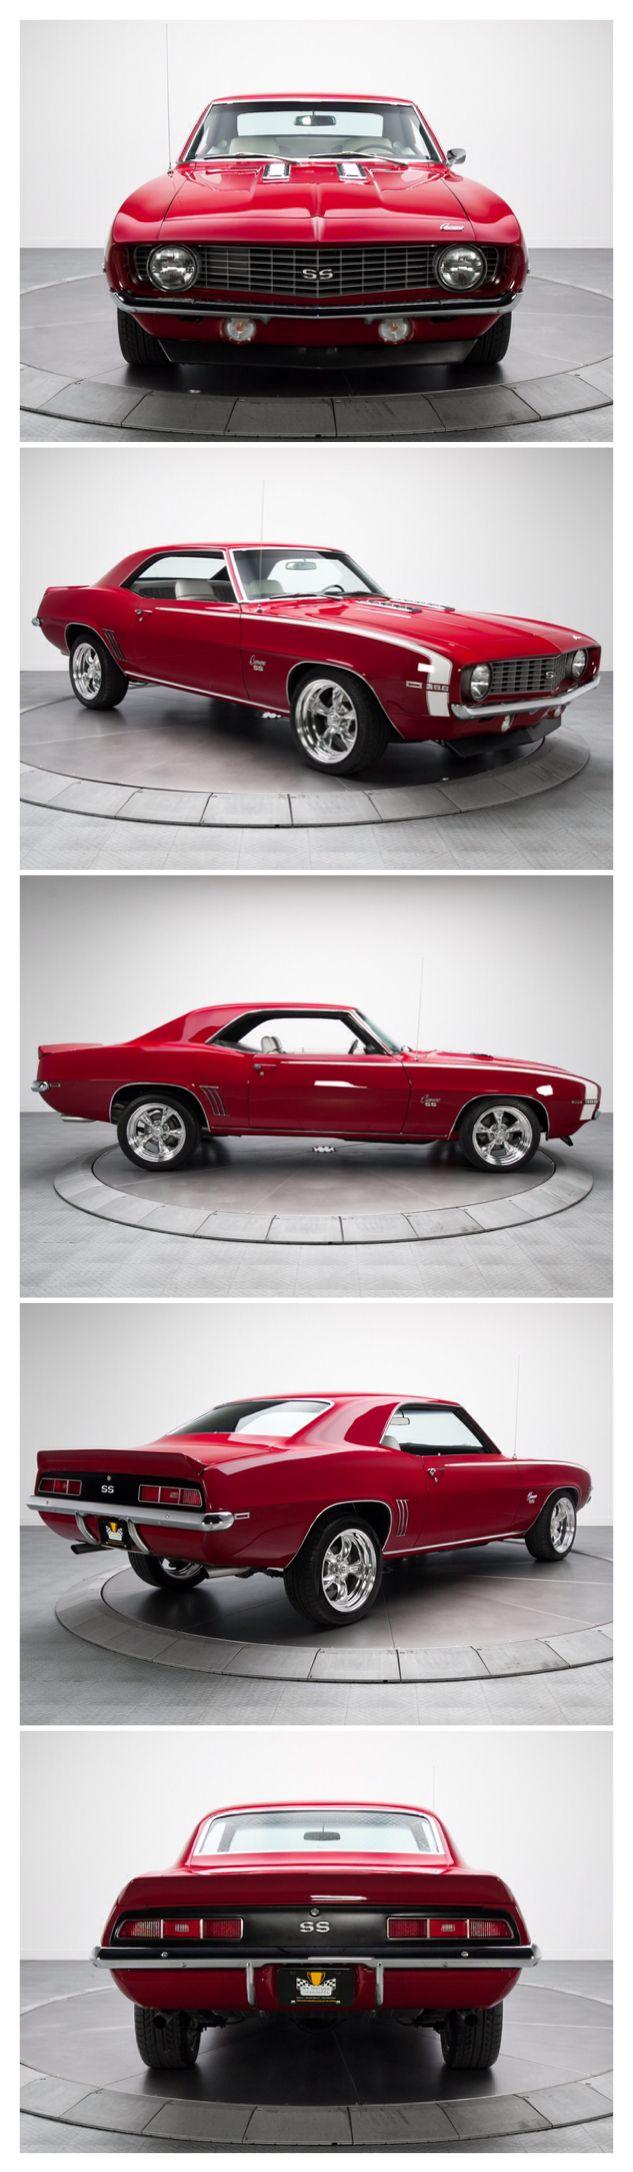 Best Camaro And Firebird Images On Pinterest Dream Cars